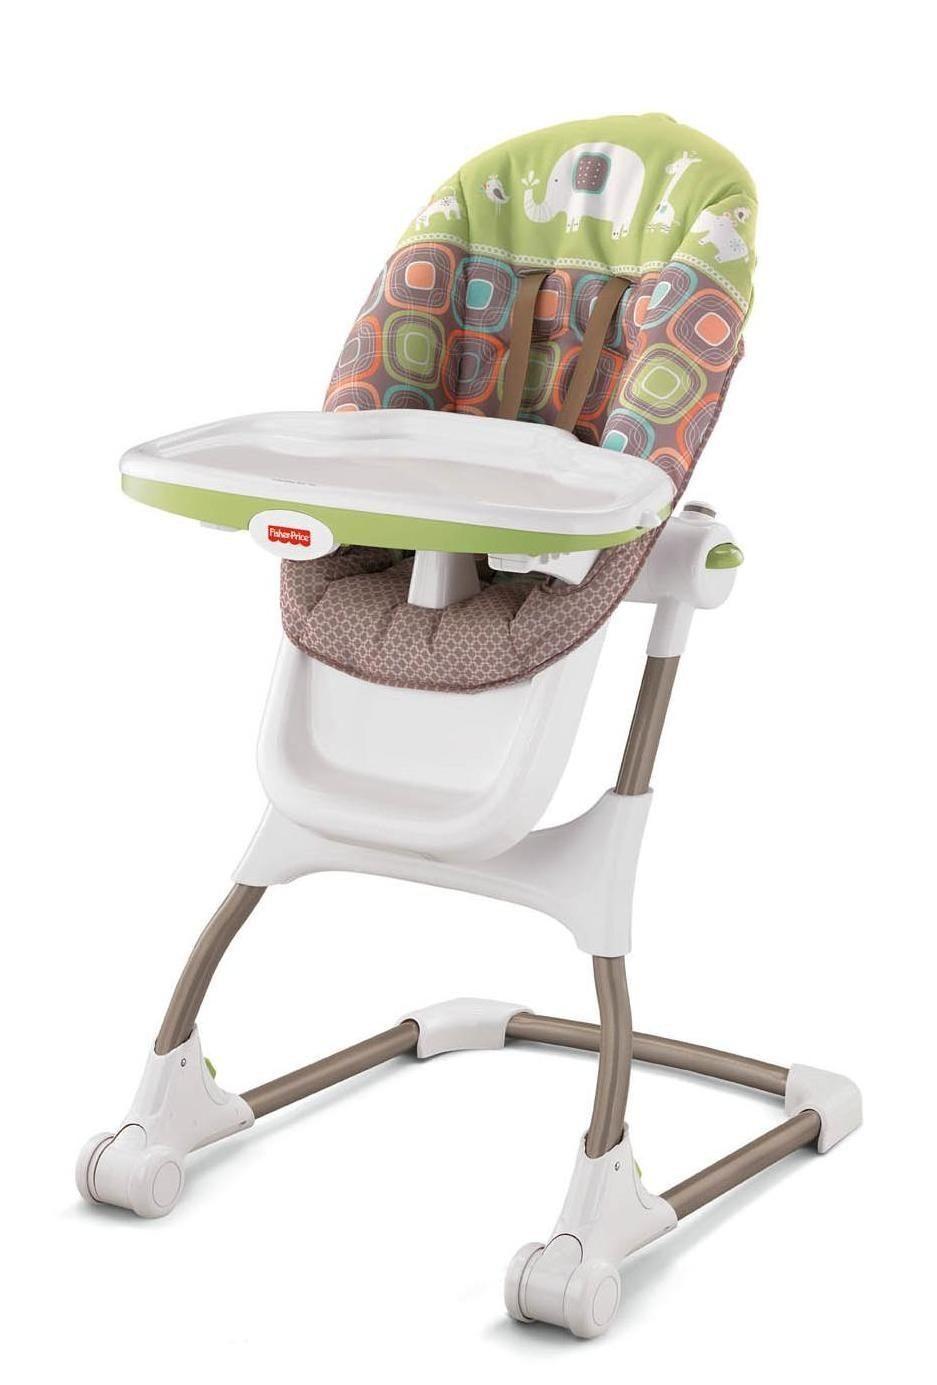 Chair fisher price high chair ez clean - Amazing Fisherprice Ez Clean Highchair U With Fisher Price Easy Fold High Chair